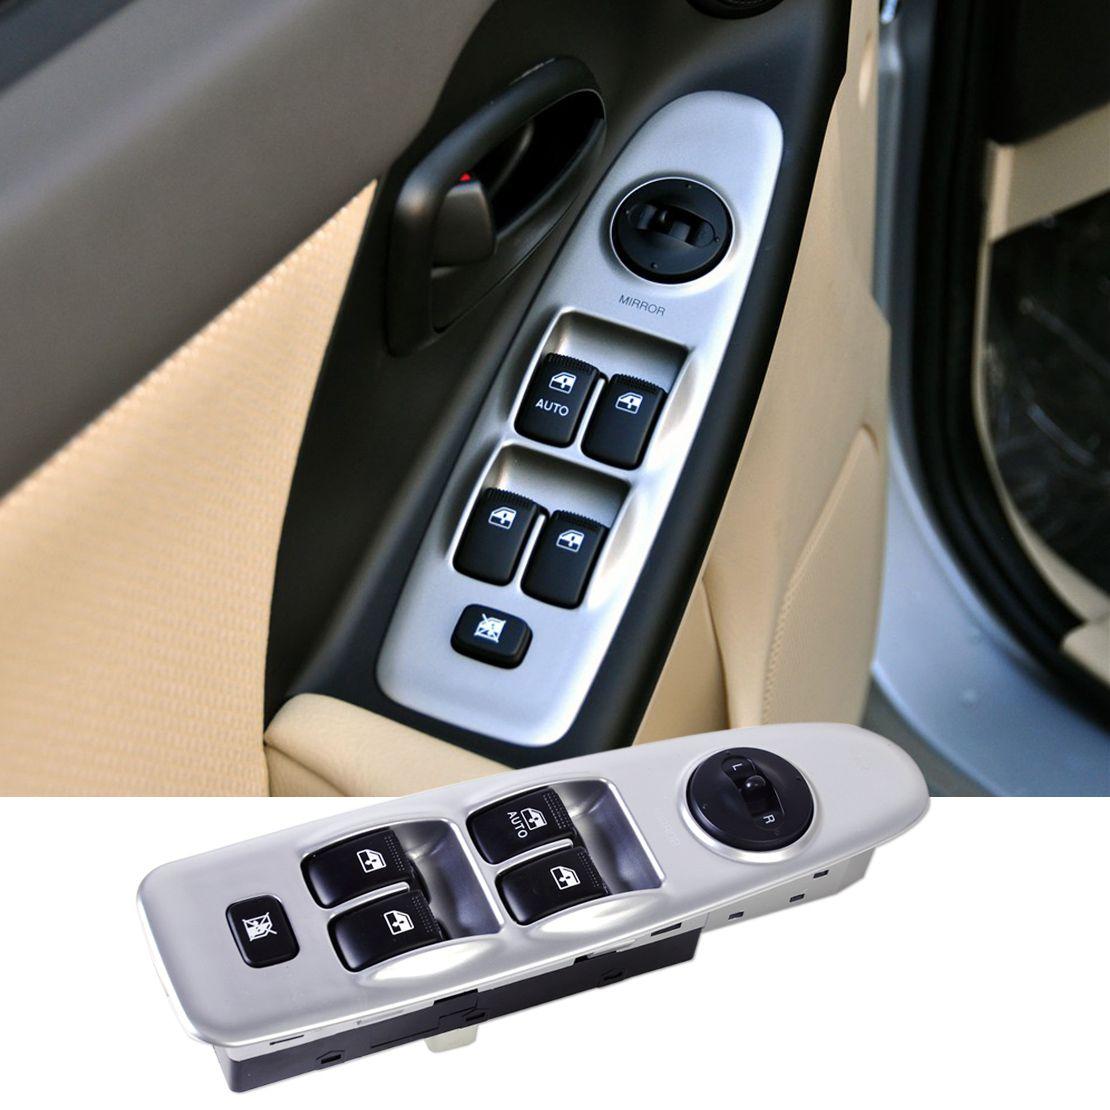 93570 2d000 Front Left Master Control Power Window Electric Switch For Hyundai Elantra 2000 2001 2002 2003 2004 2005 2006 Elantra Hyundai Elantra Hyundai